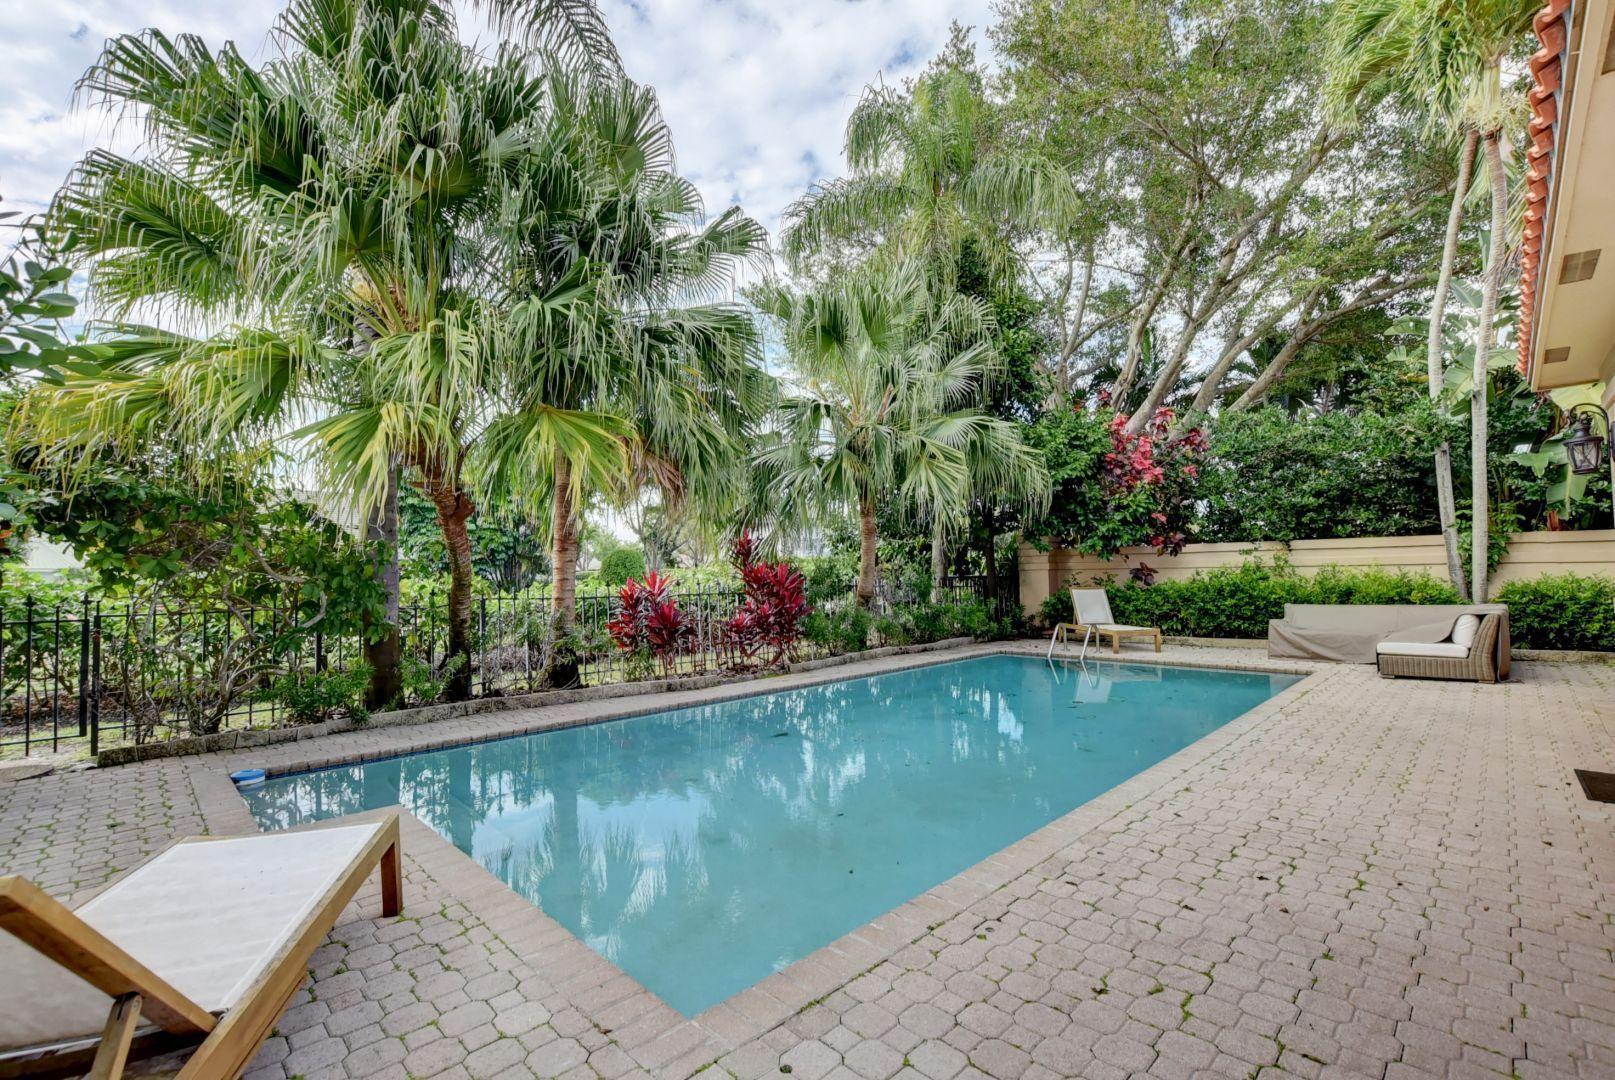 21237 Harrow Court  Boca Raton, FL 33433